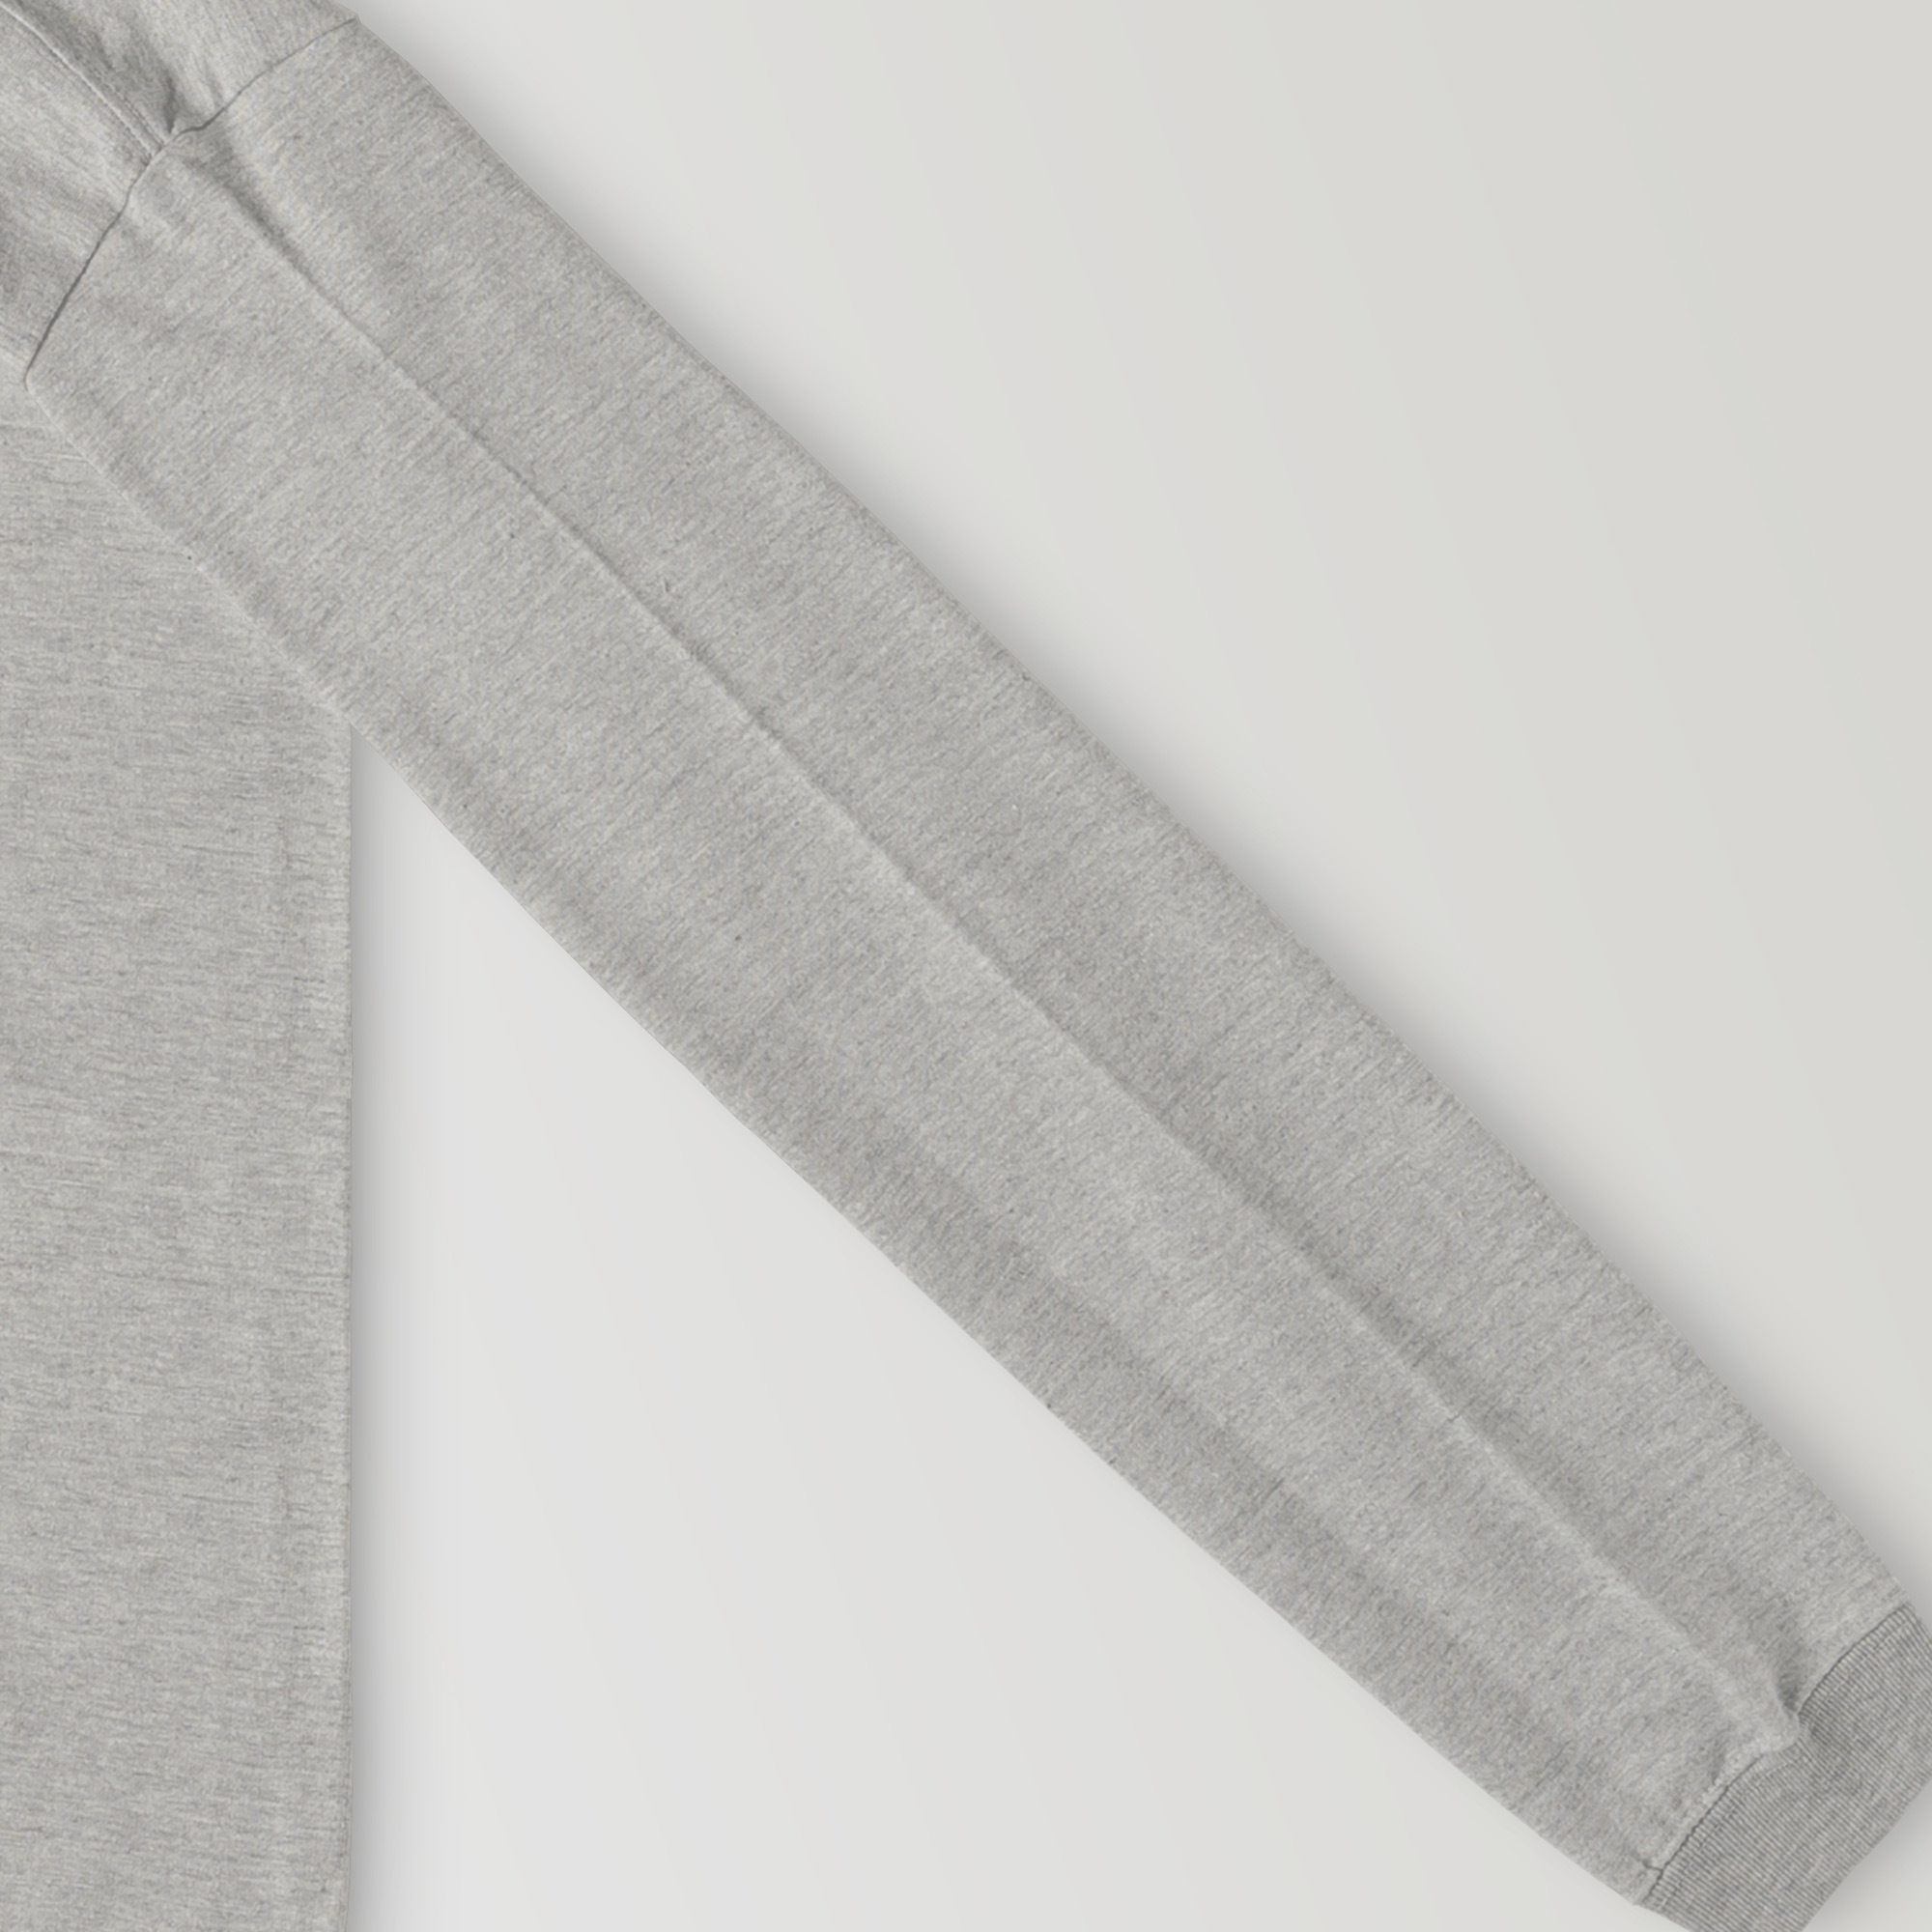 ahahahana/GRY/モノトーン【シンプルデザインTシャツ】©mayu_color.888